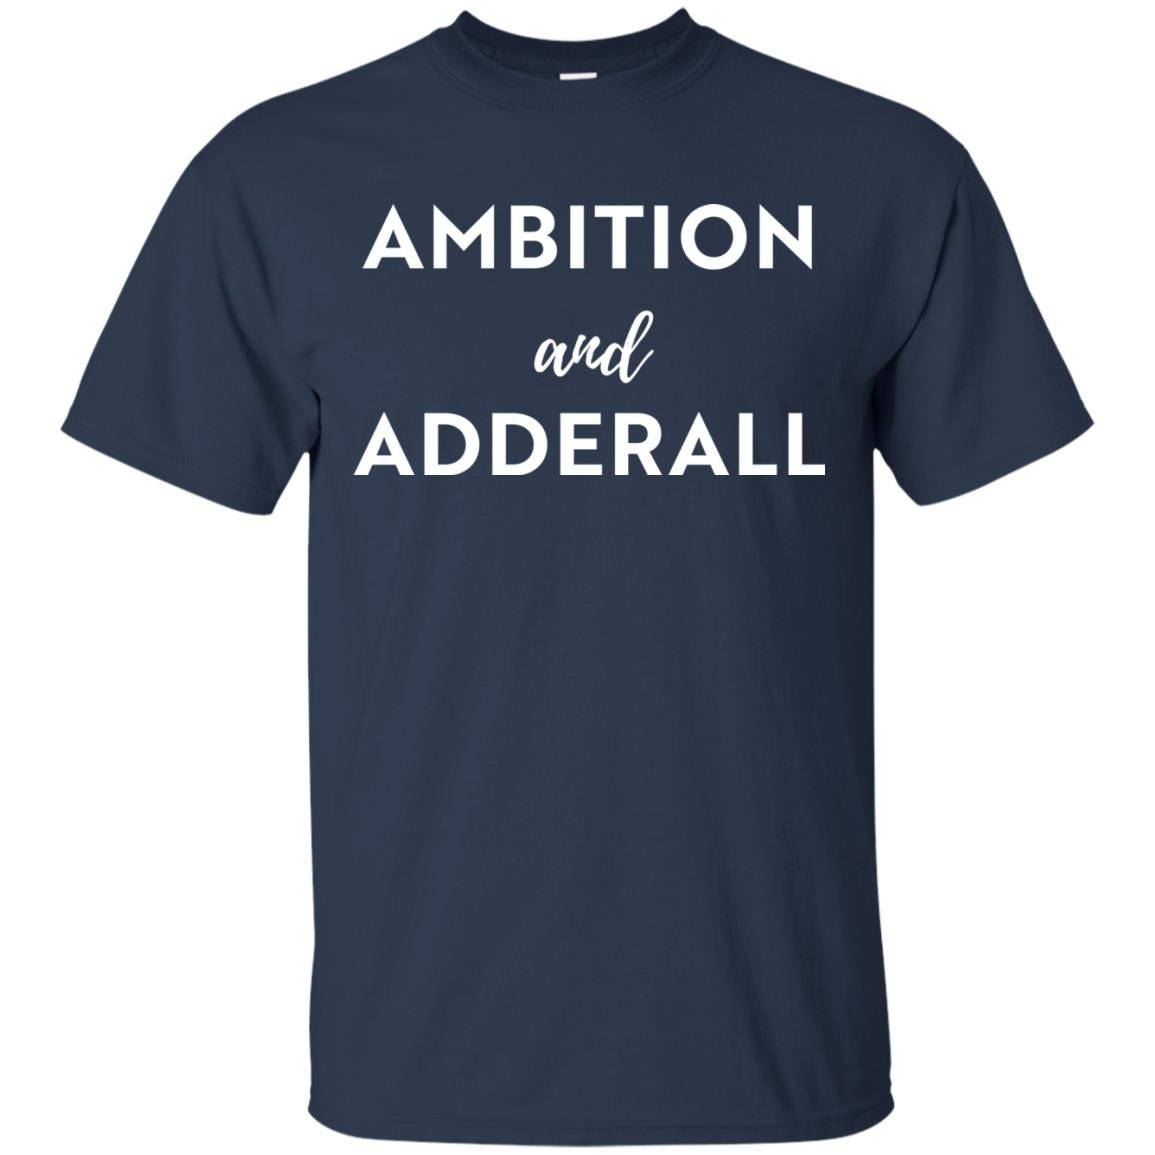 image 2 - Ambition and Adderall T-shirt, Sweatshirt